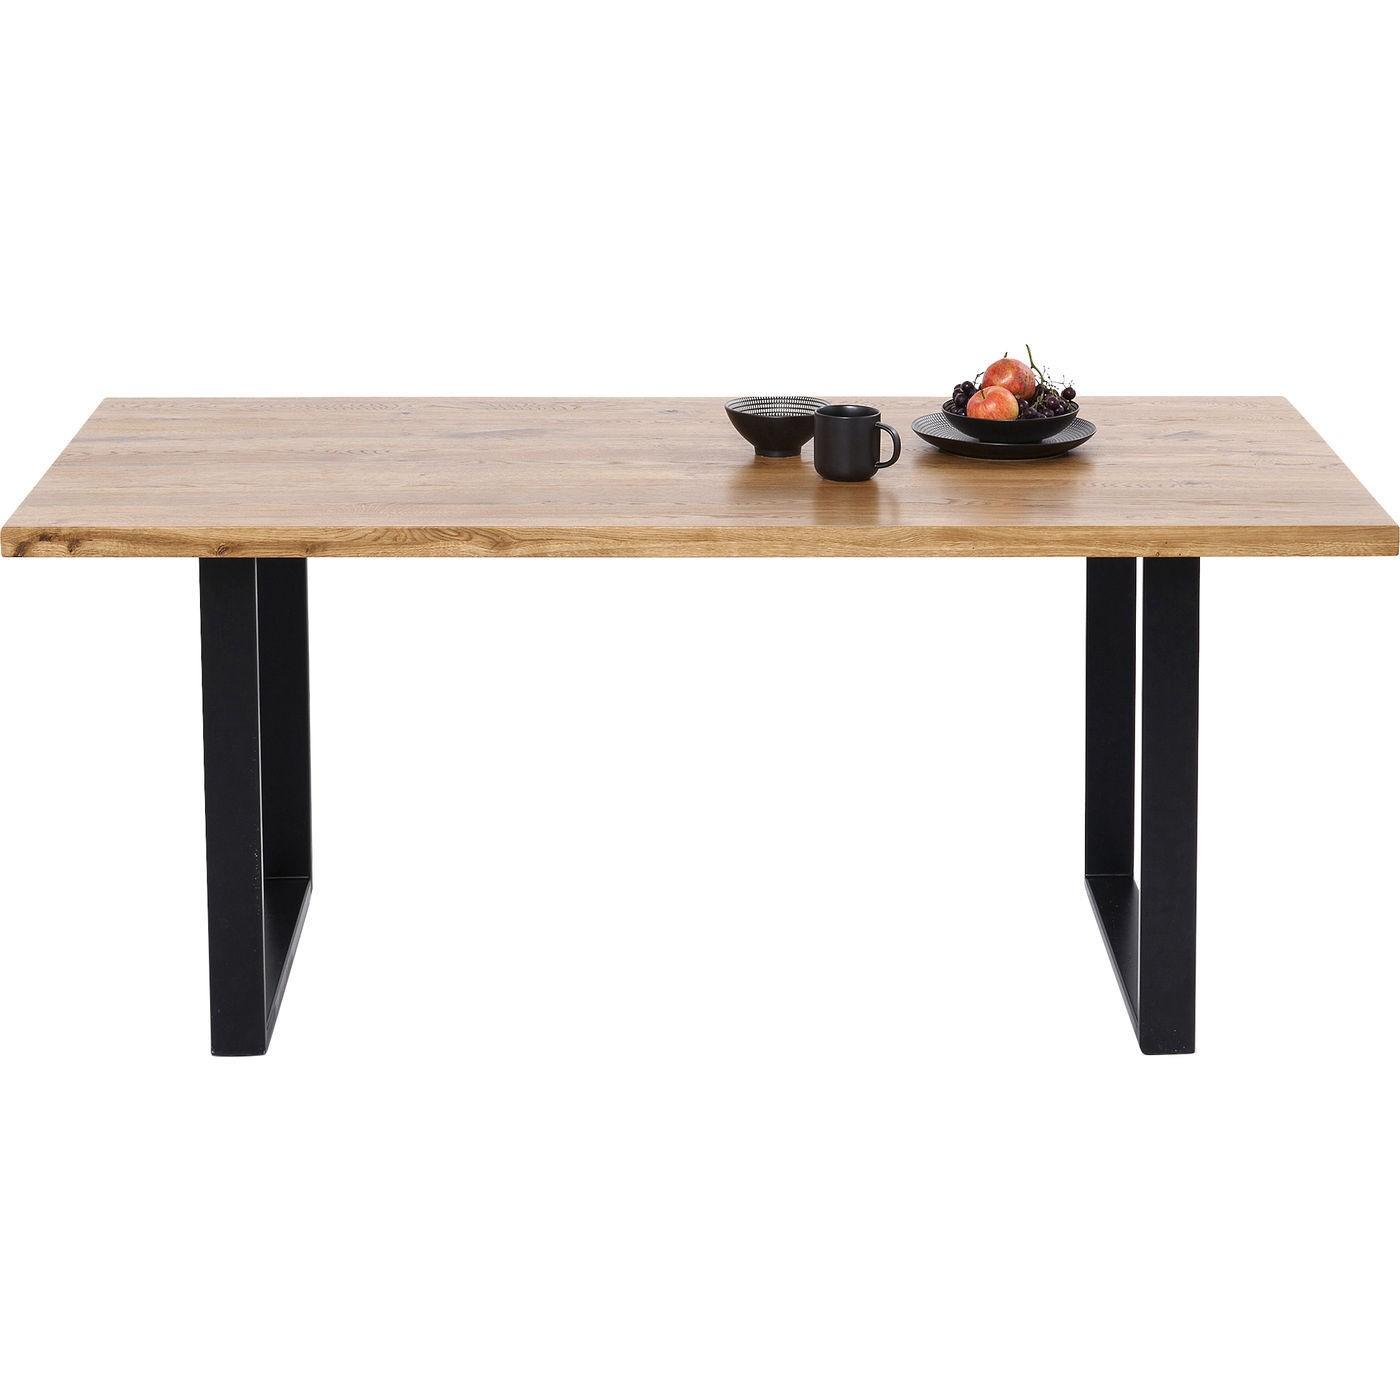 Table Jackie chêne noire 200x100cm Kare Design